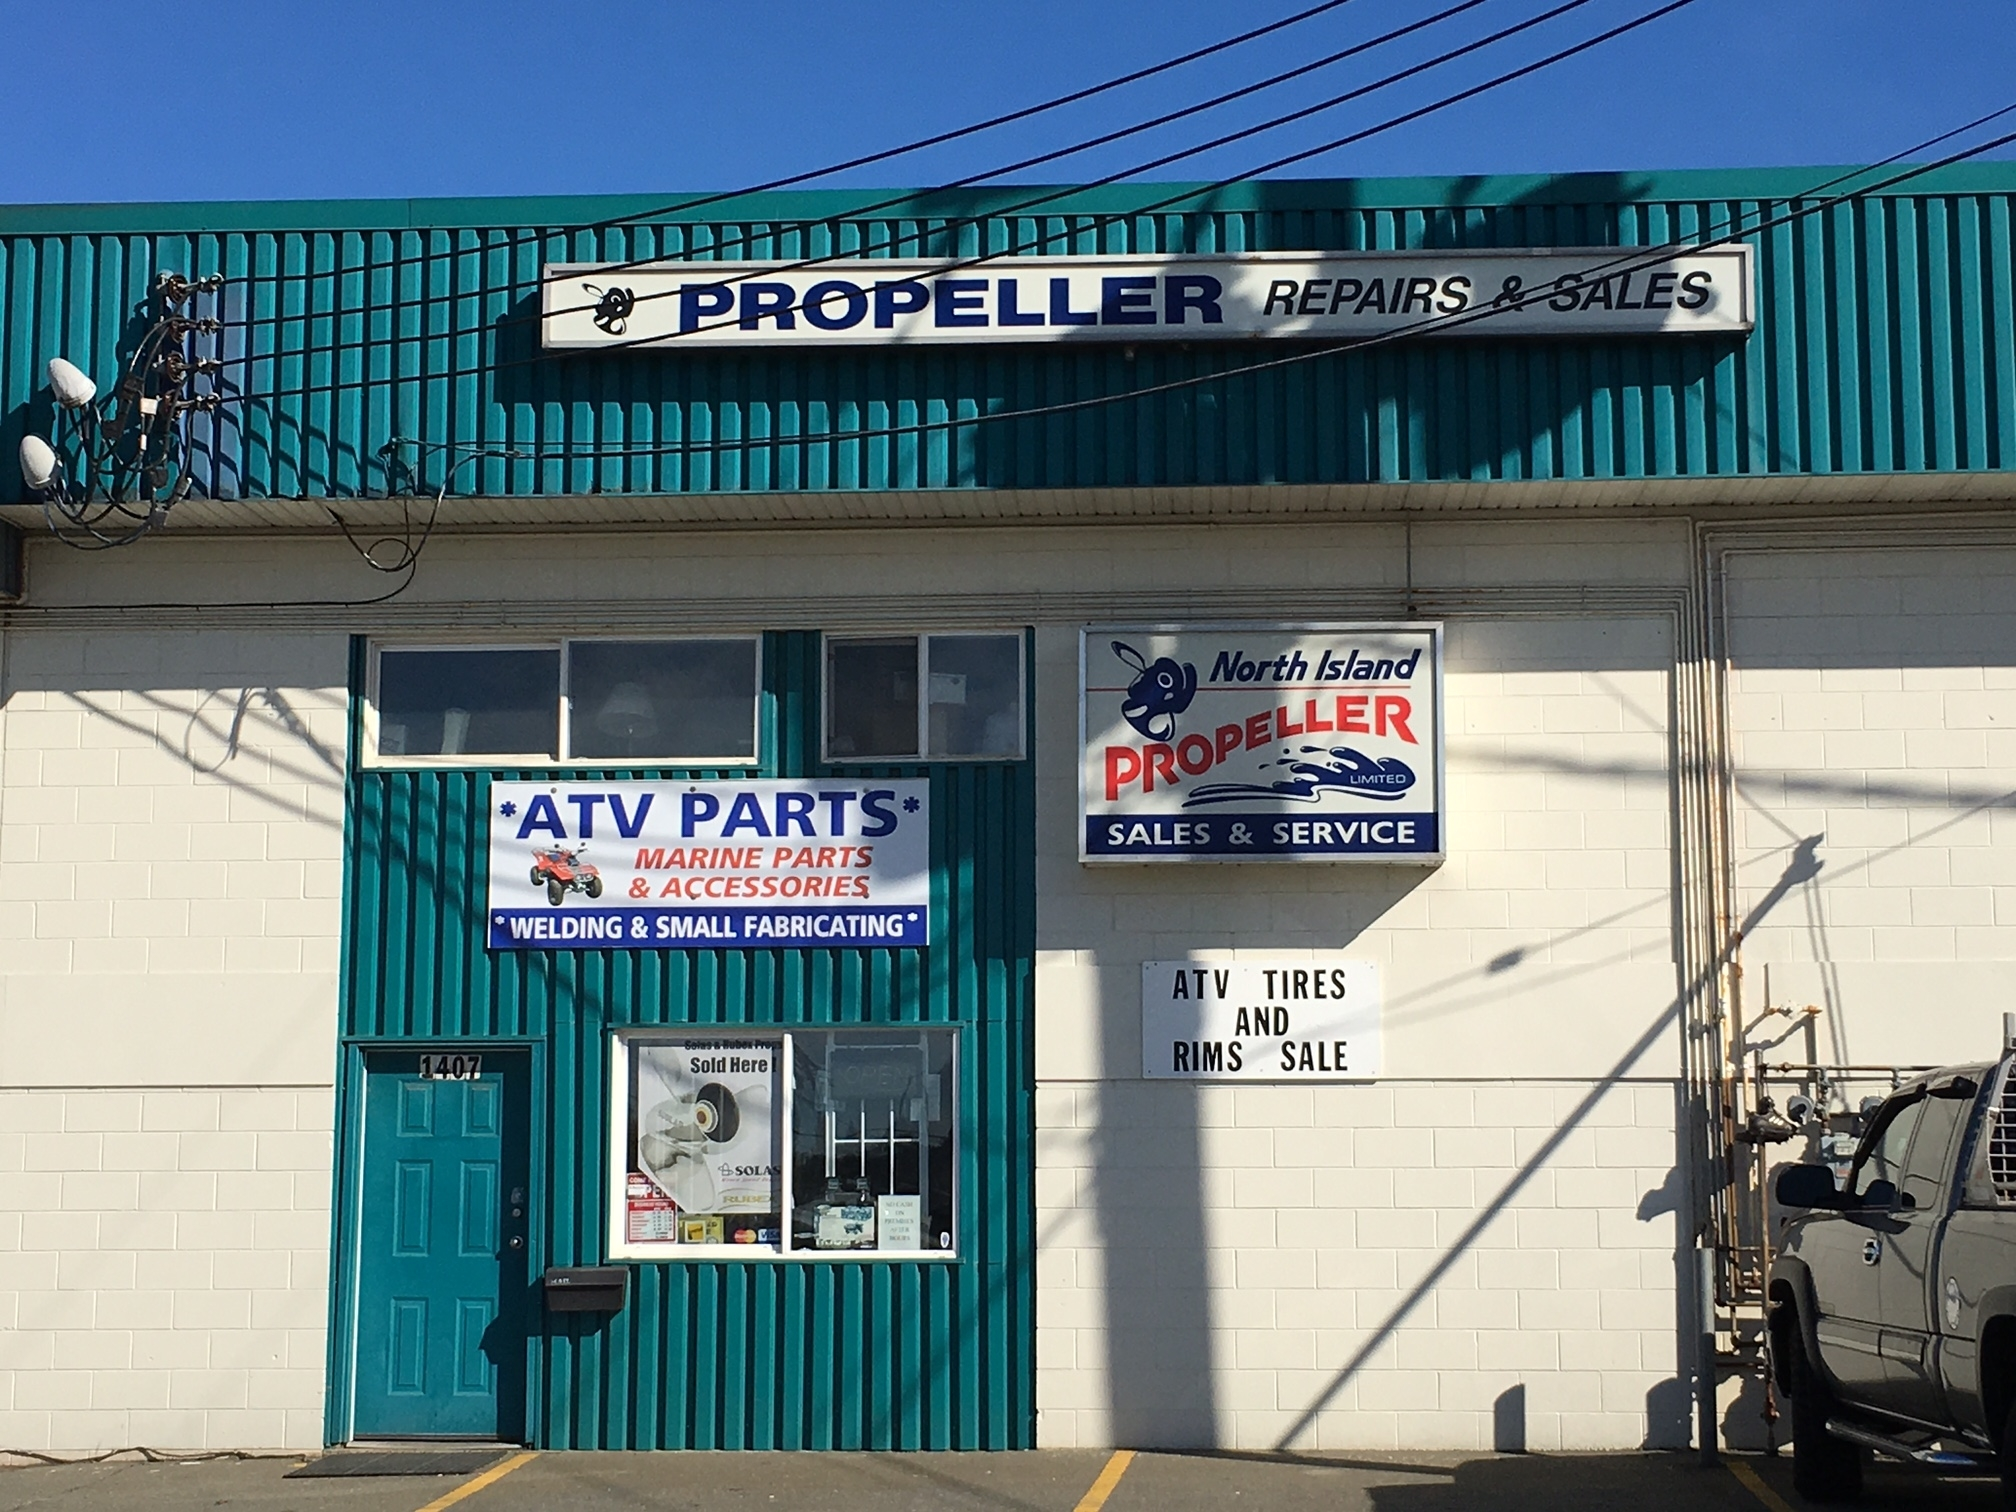 North Island Propeller Ltd in Campbell River